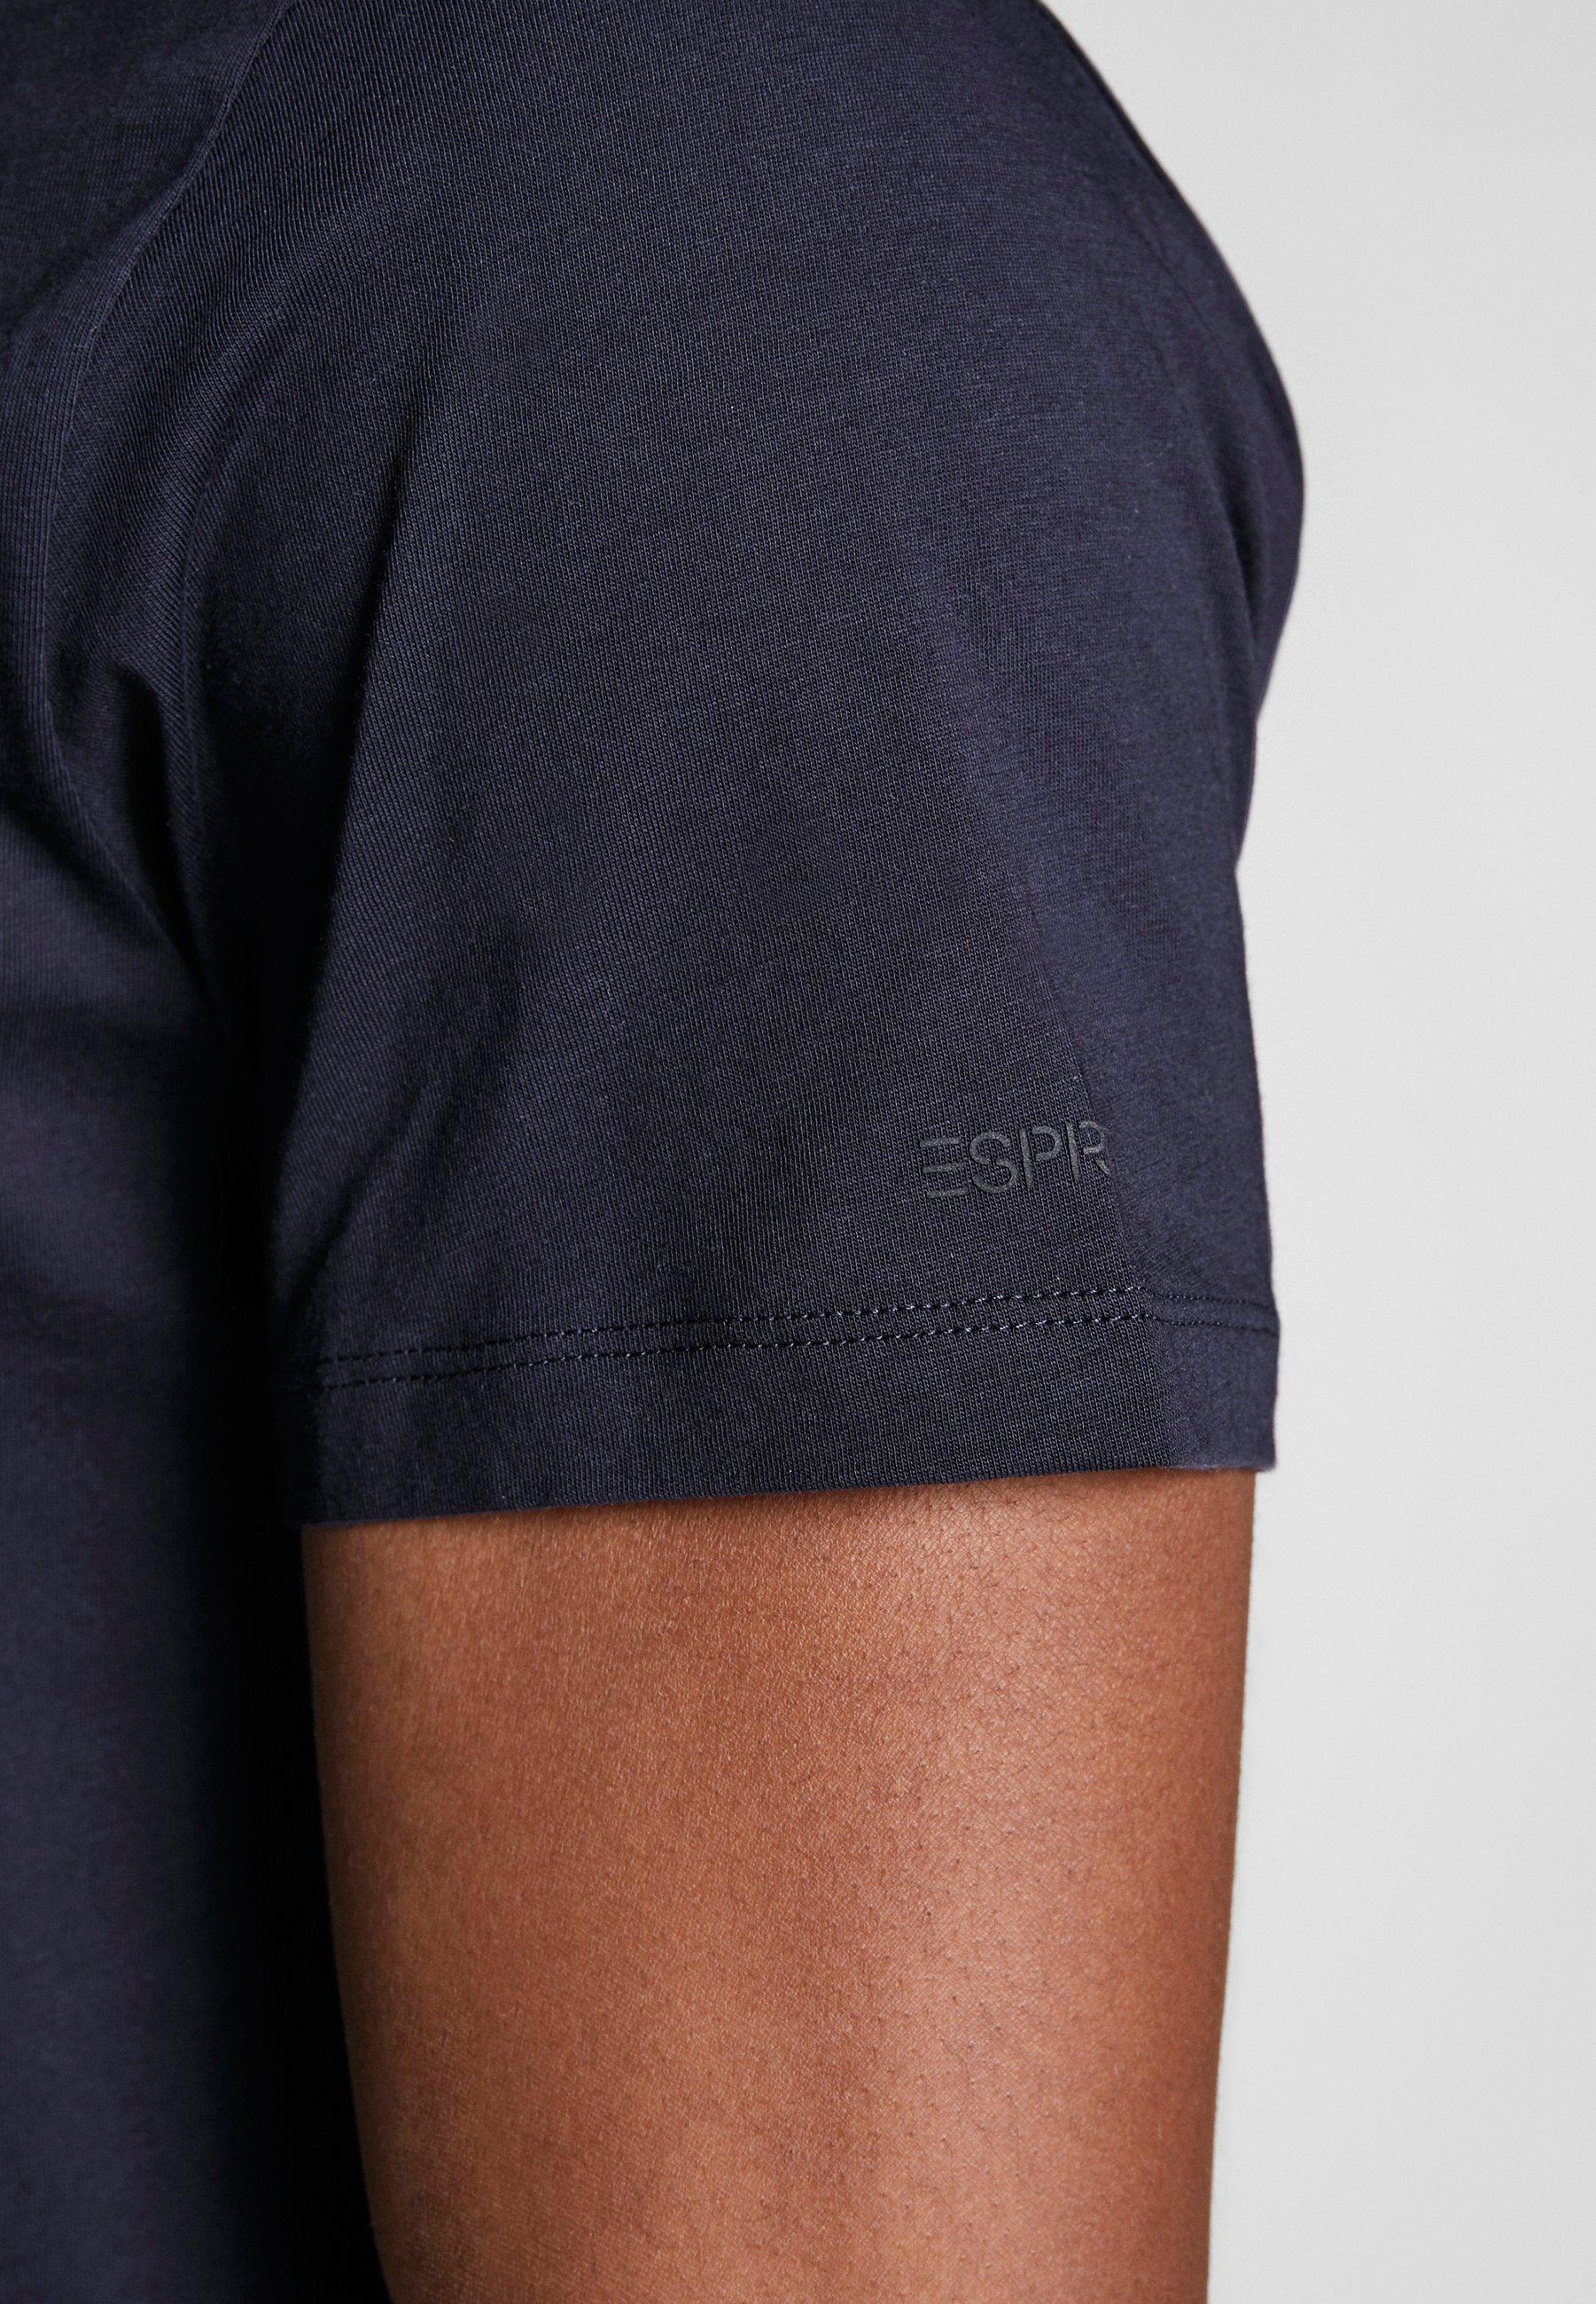 Esprit T-shirt basic - navy